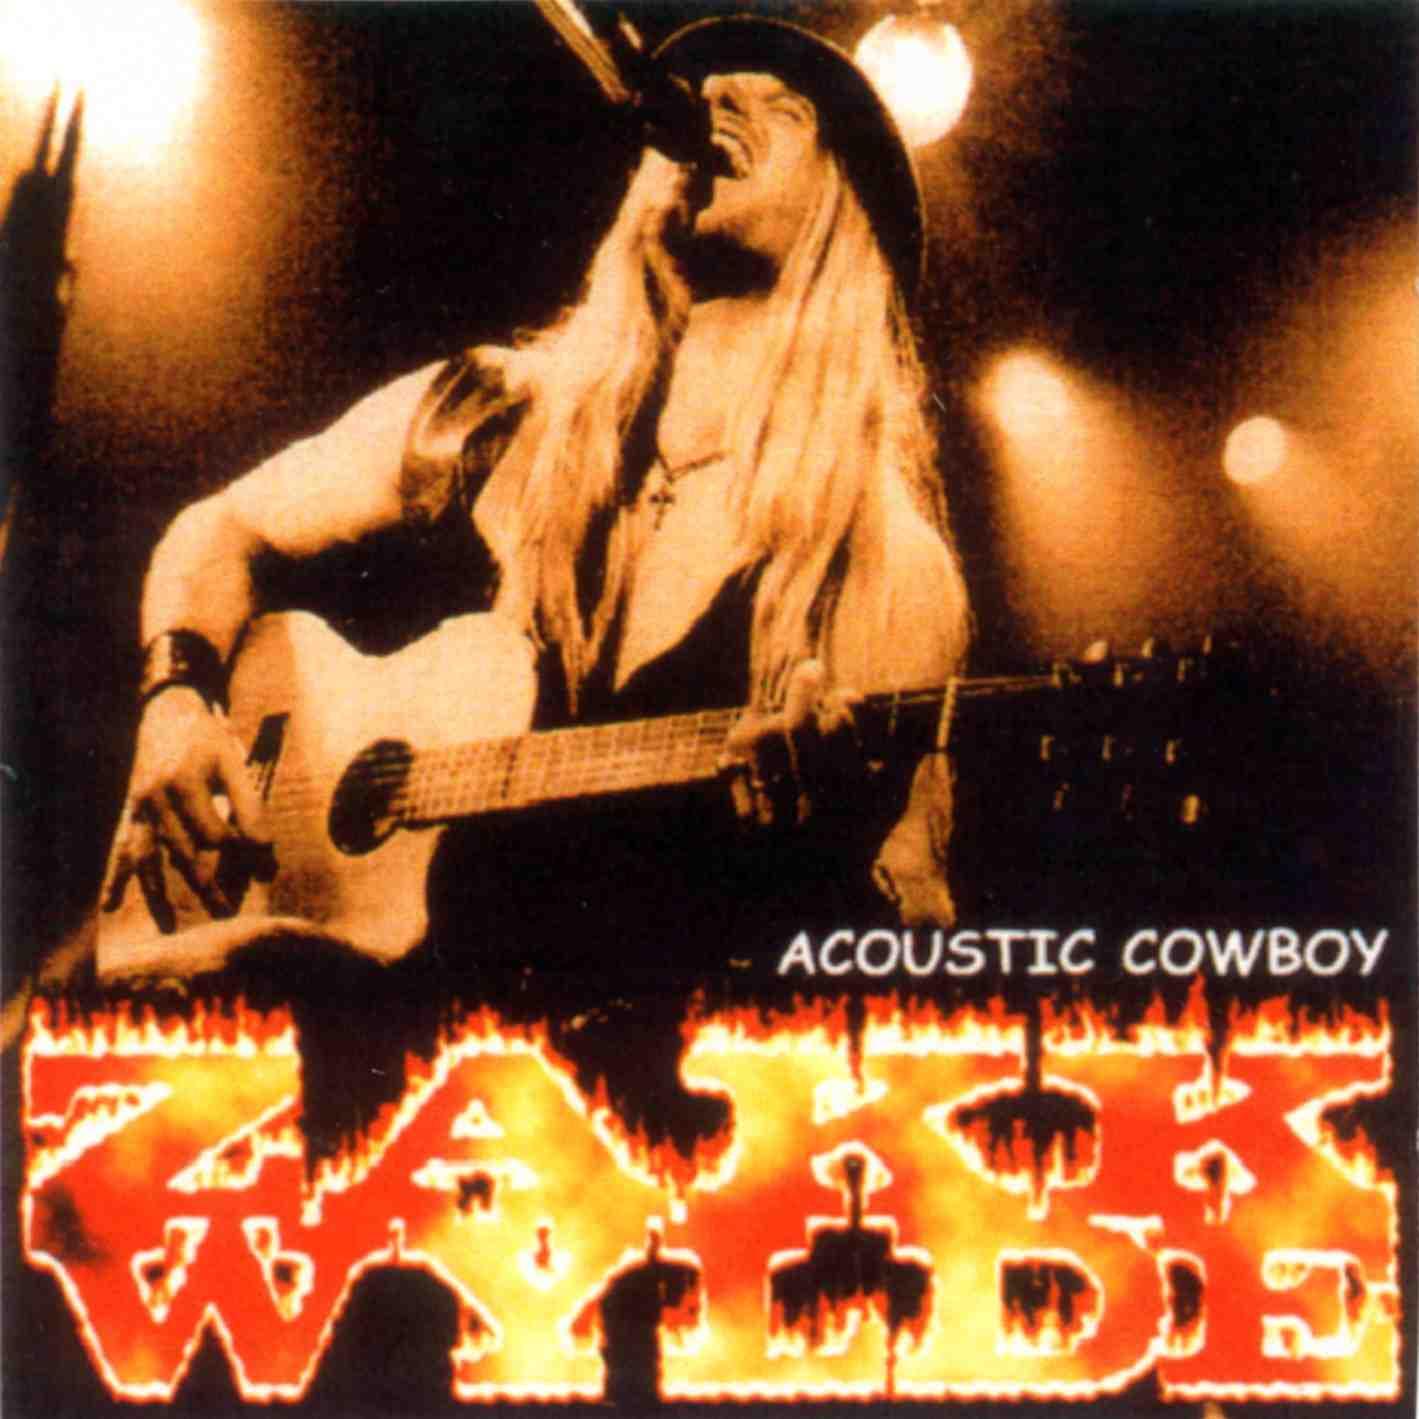 Rock Rare Records: Zakk Wylde - Acoustic Cowboy (1997) FLAC